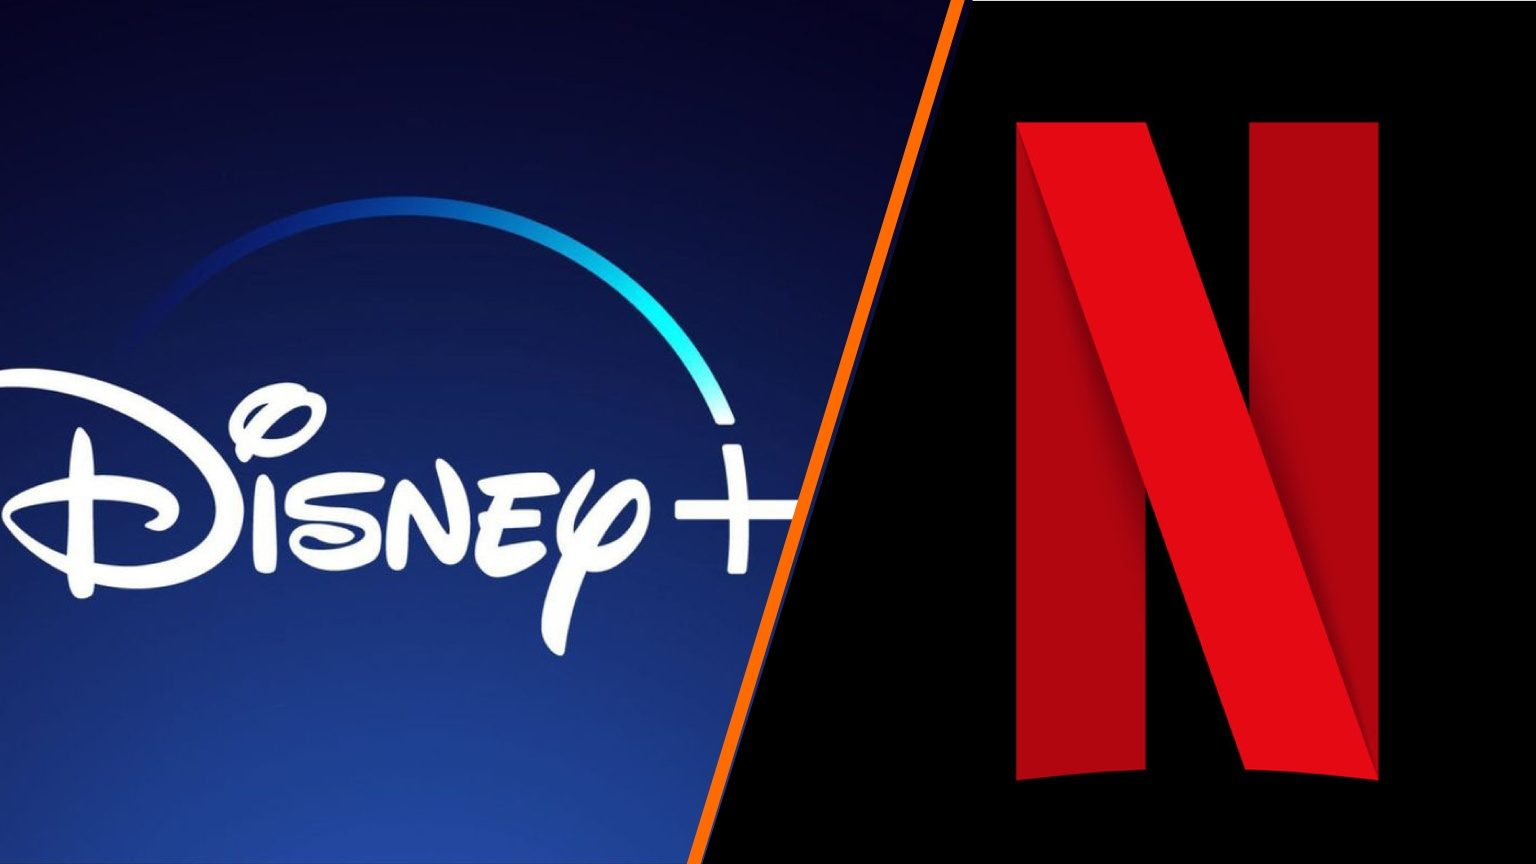 Disney Plus vs Netflix M